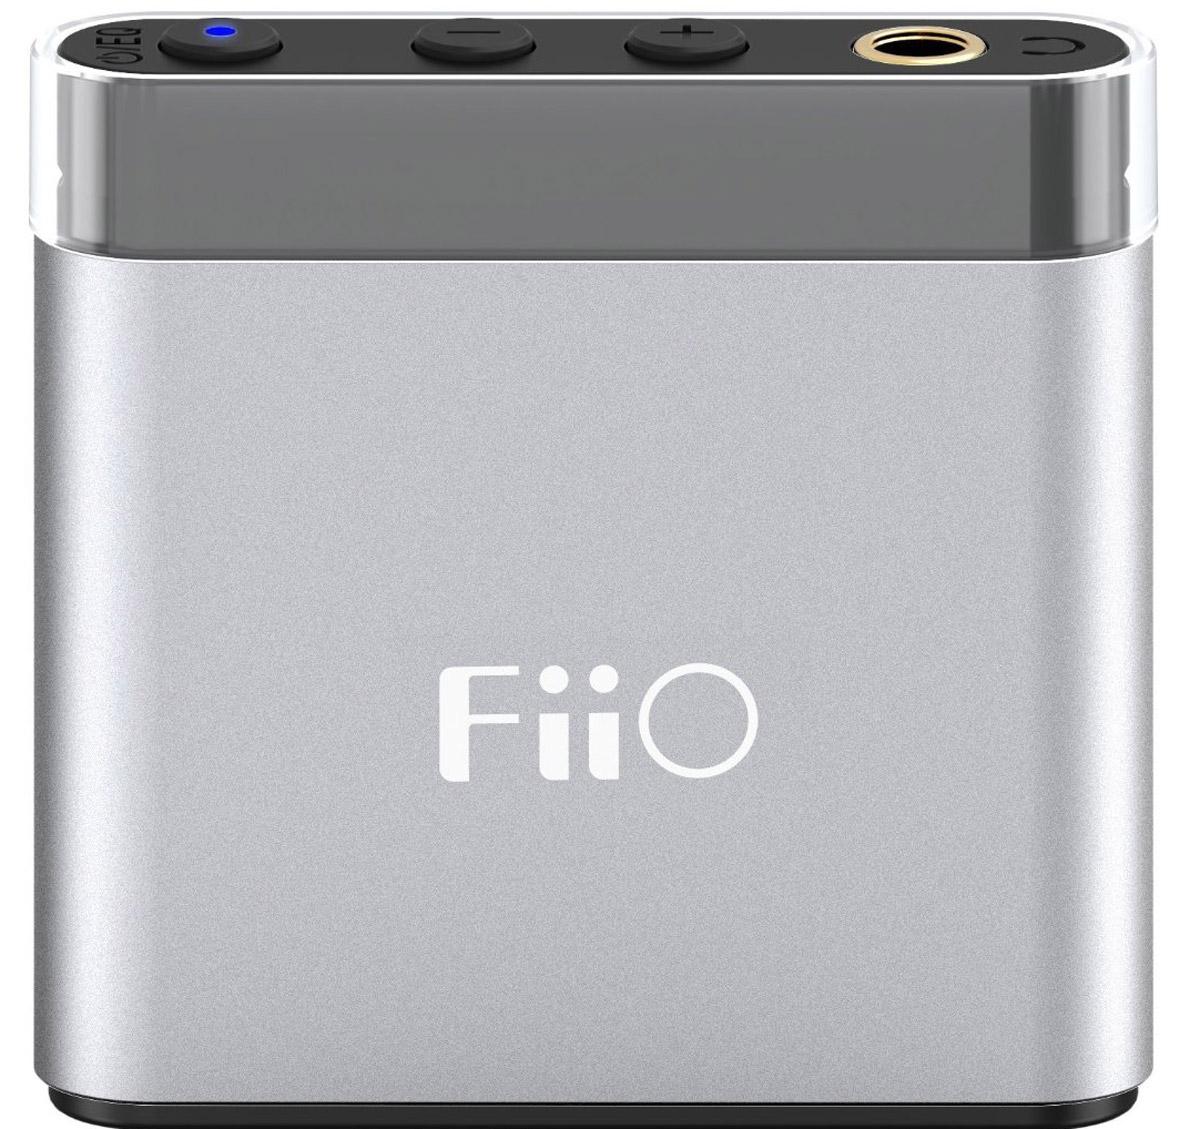 Fiio A1 усилитель для наушников усилитель для наушников fiio btr1 black